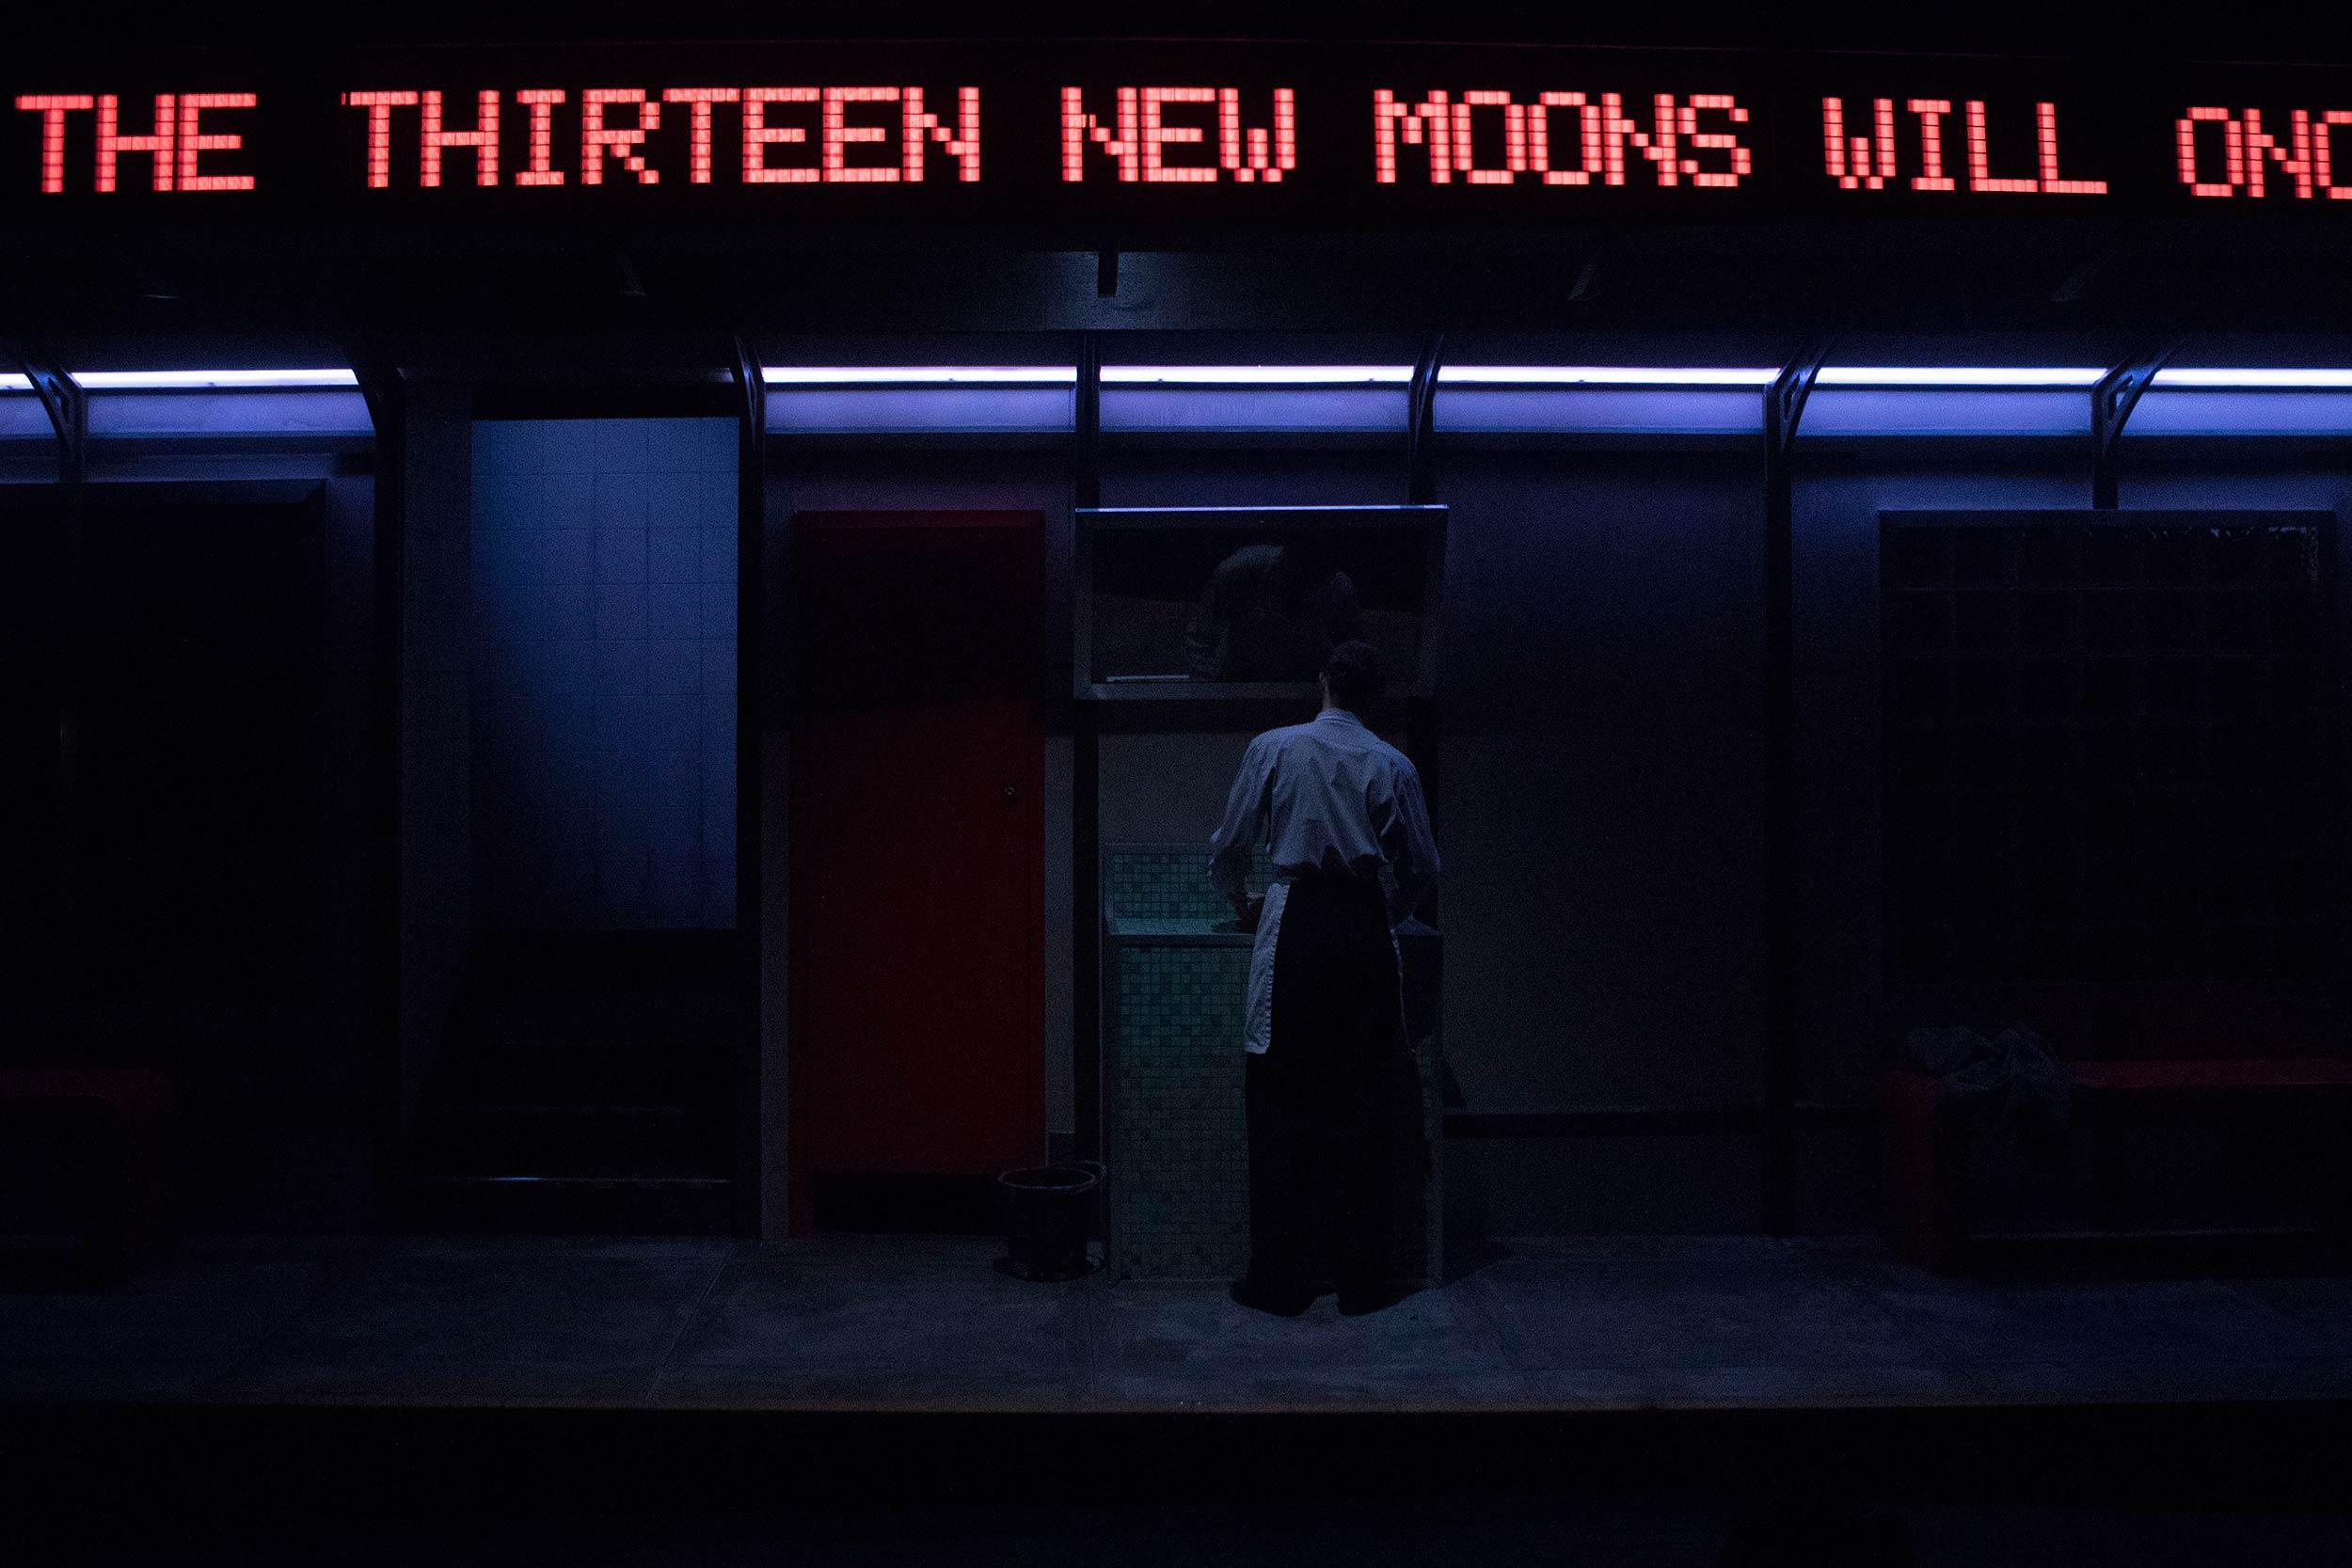 In-a-year-with-13-moons-1-CRIS-BALDWIN.jpg